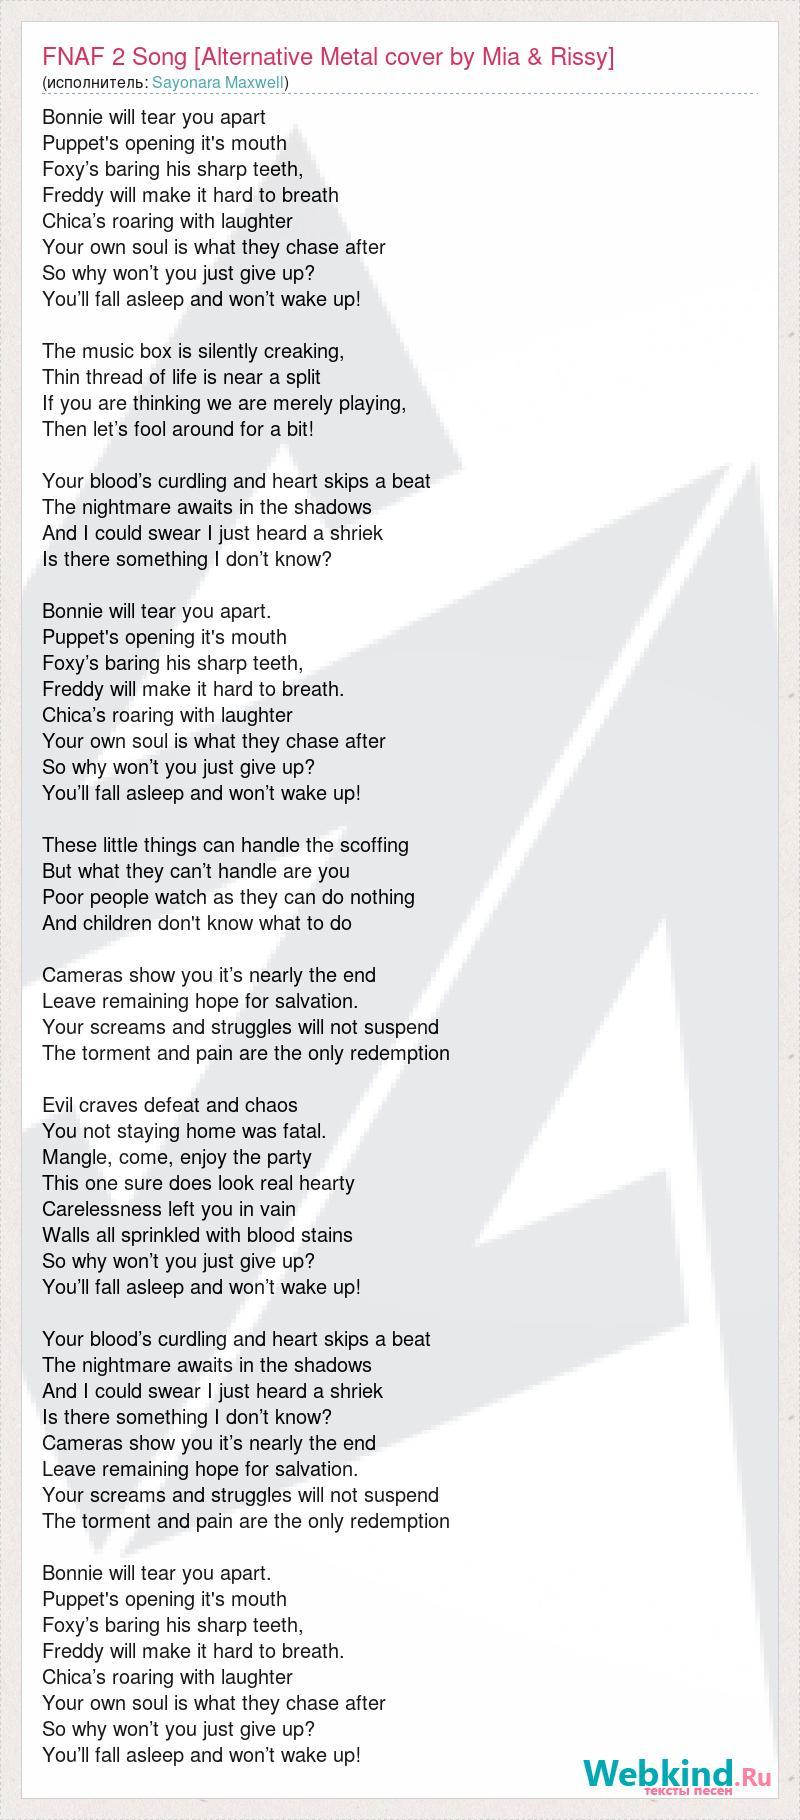 Sayonara Maxwell: FNAF 2 Song [Alternative Metal cover by Mia